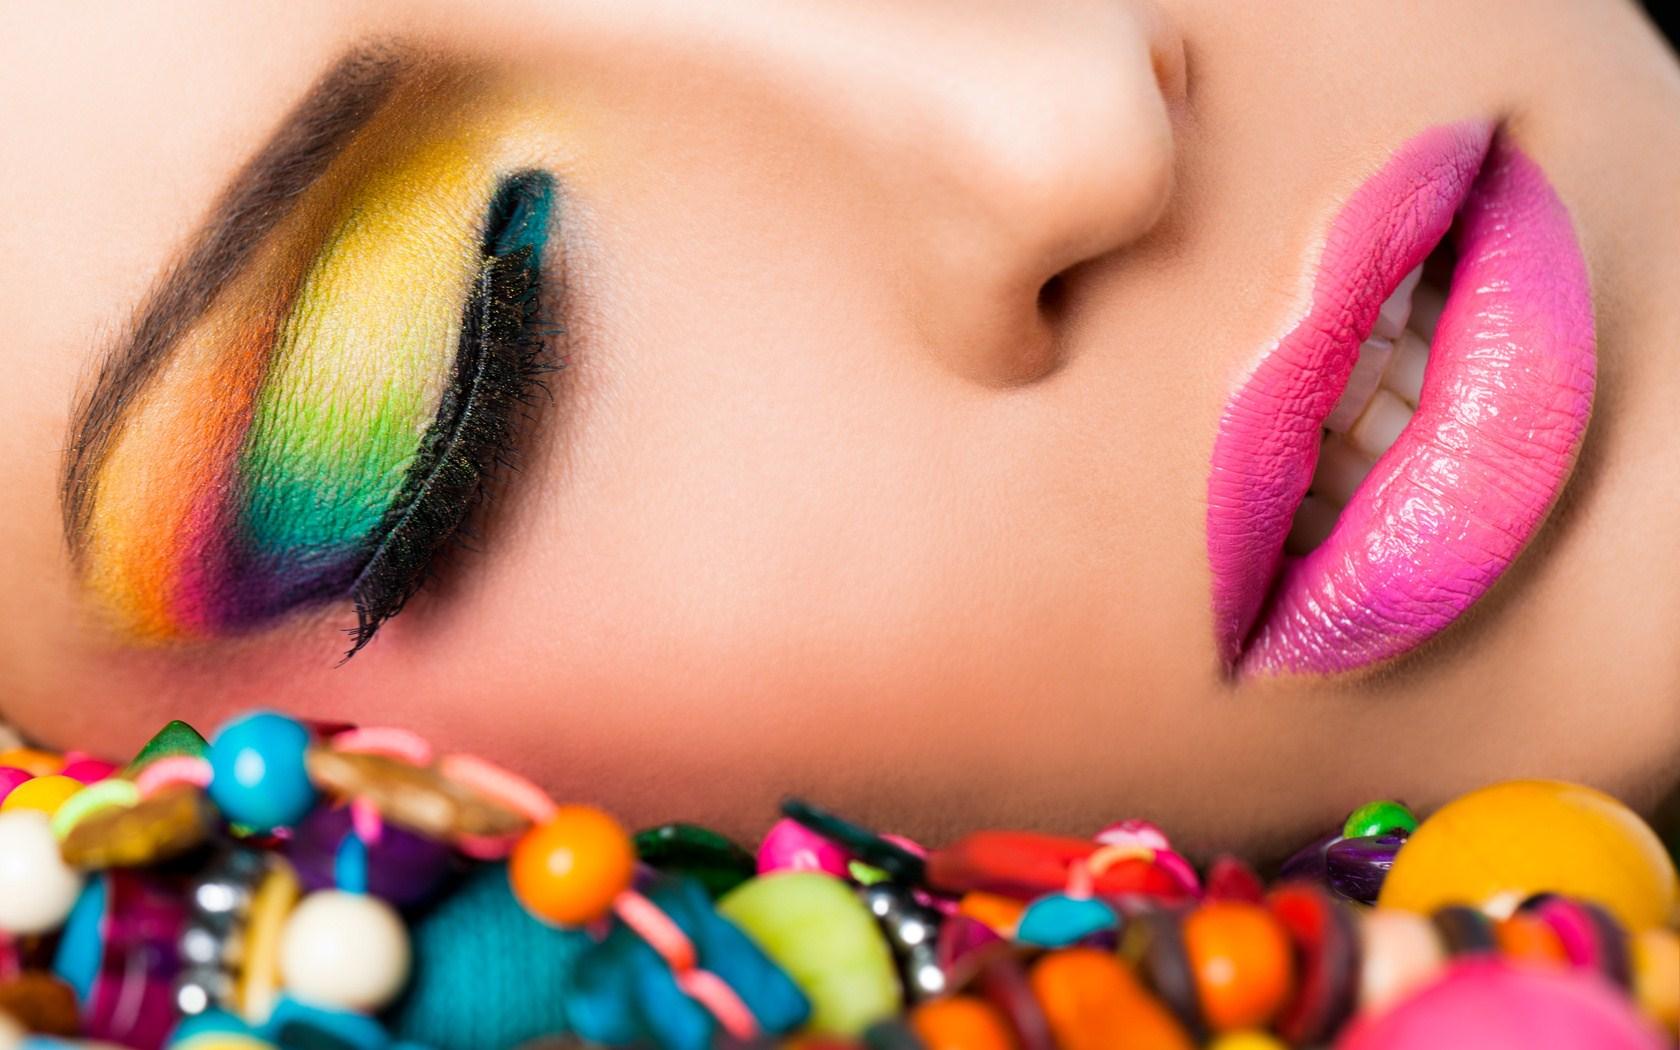 animated makeup wallpaper - photo #35